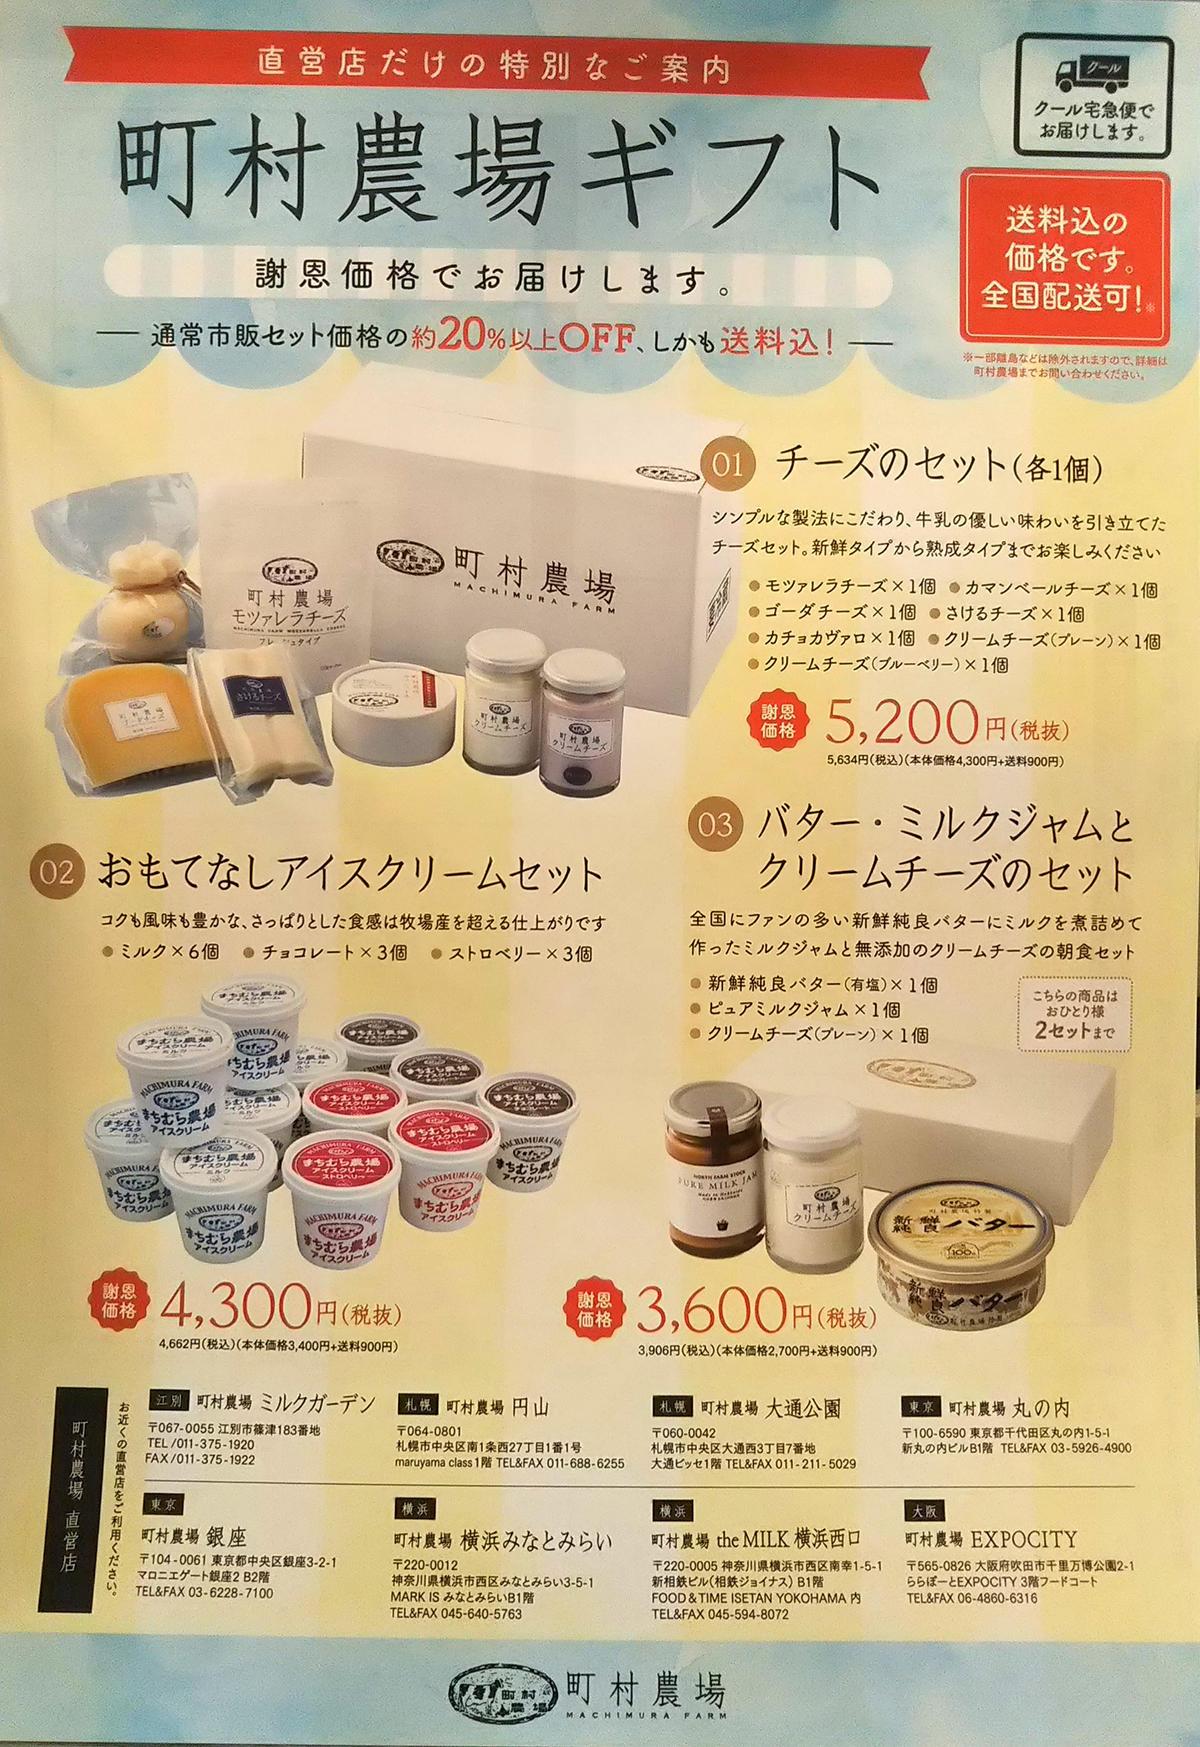 https://www.odori-bisse.com/info/machimura_201102_img.jpg